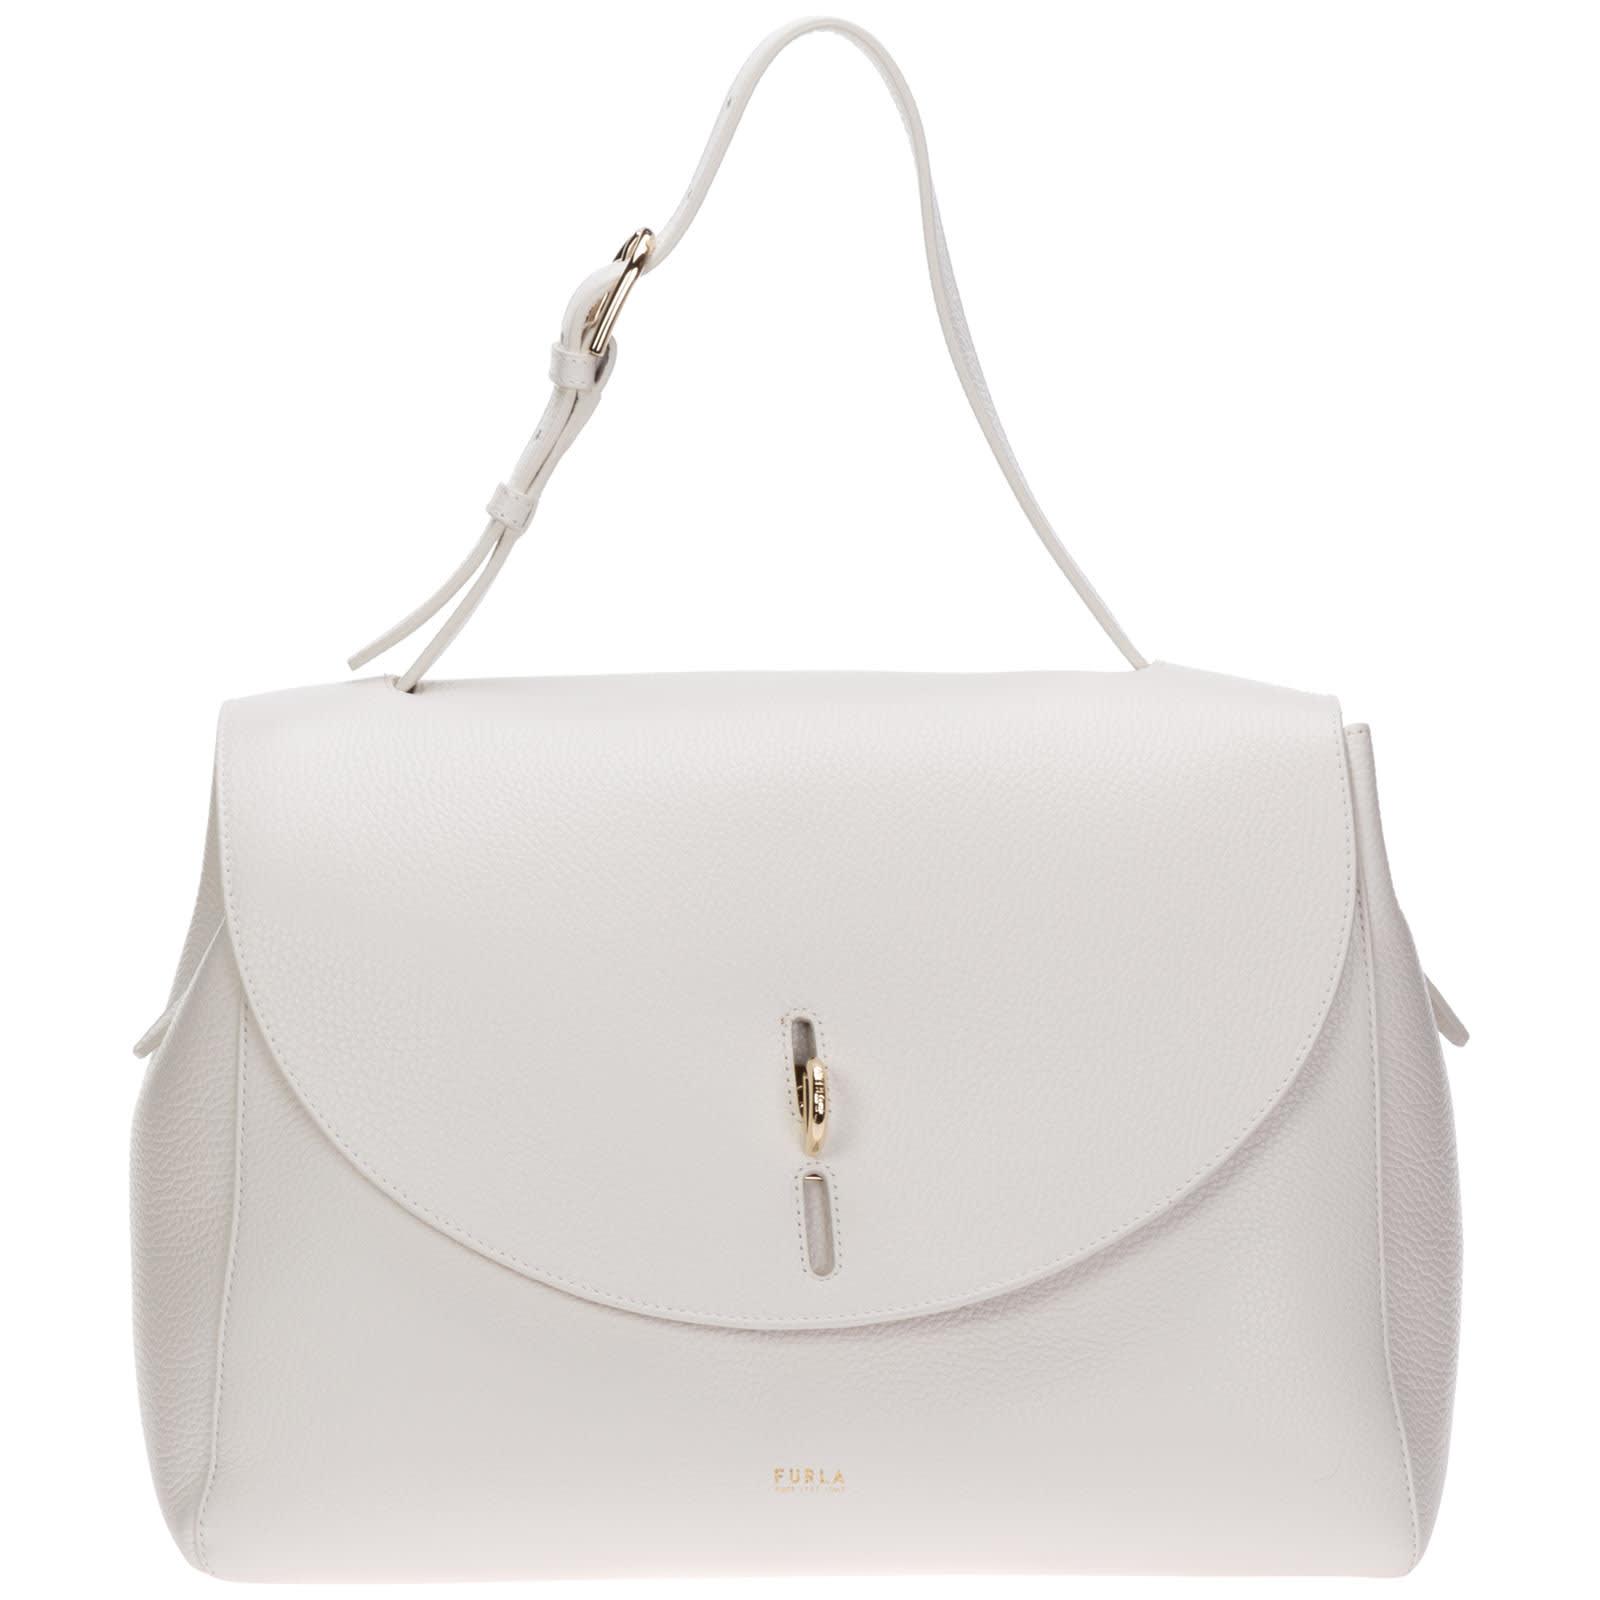 Furla H222 Handbags